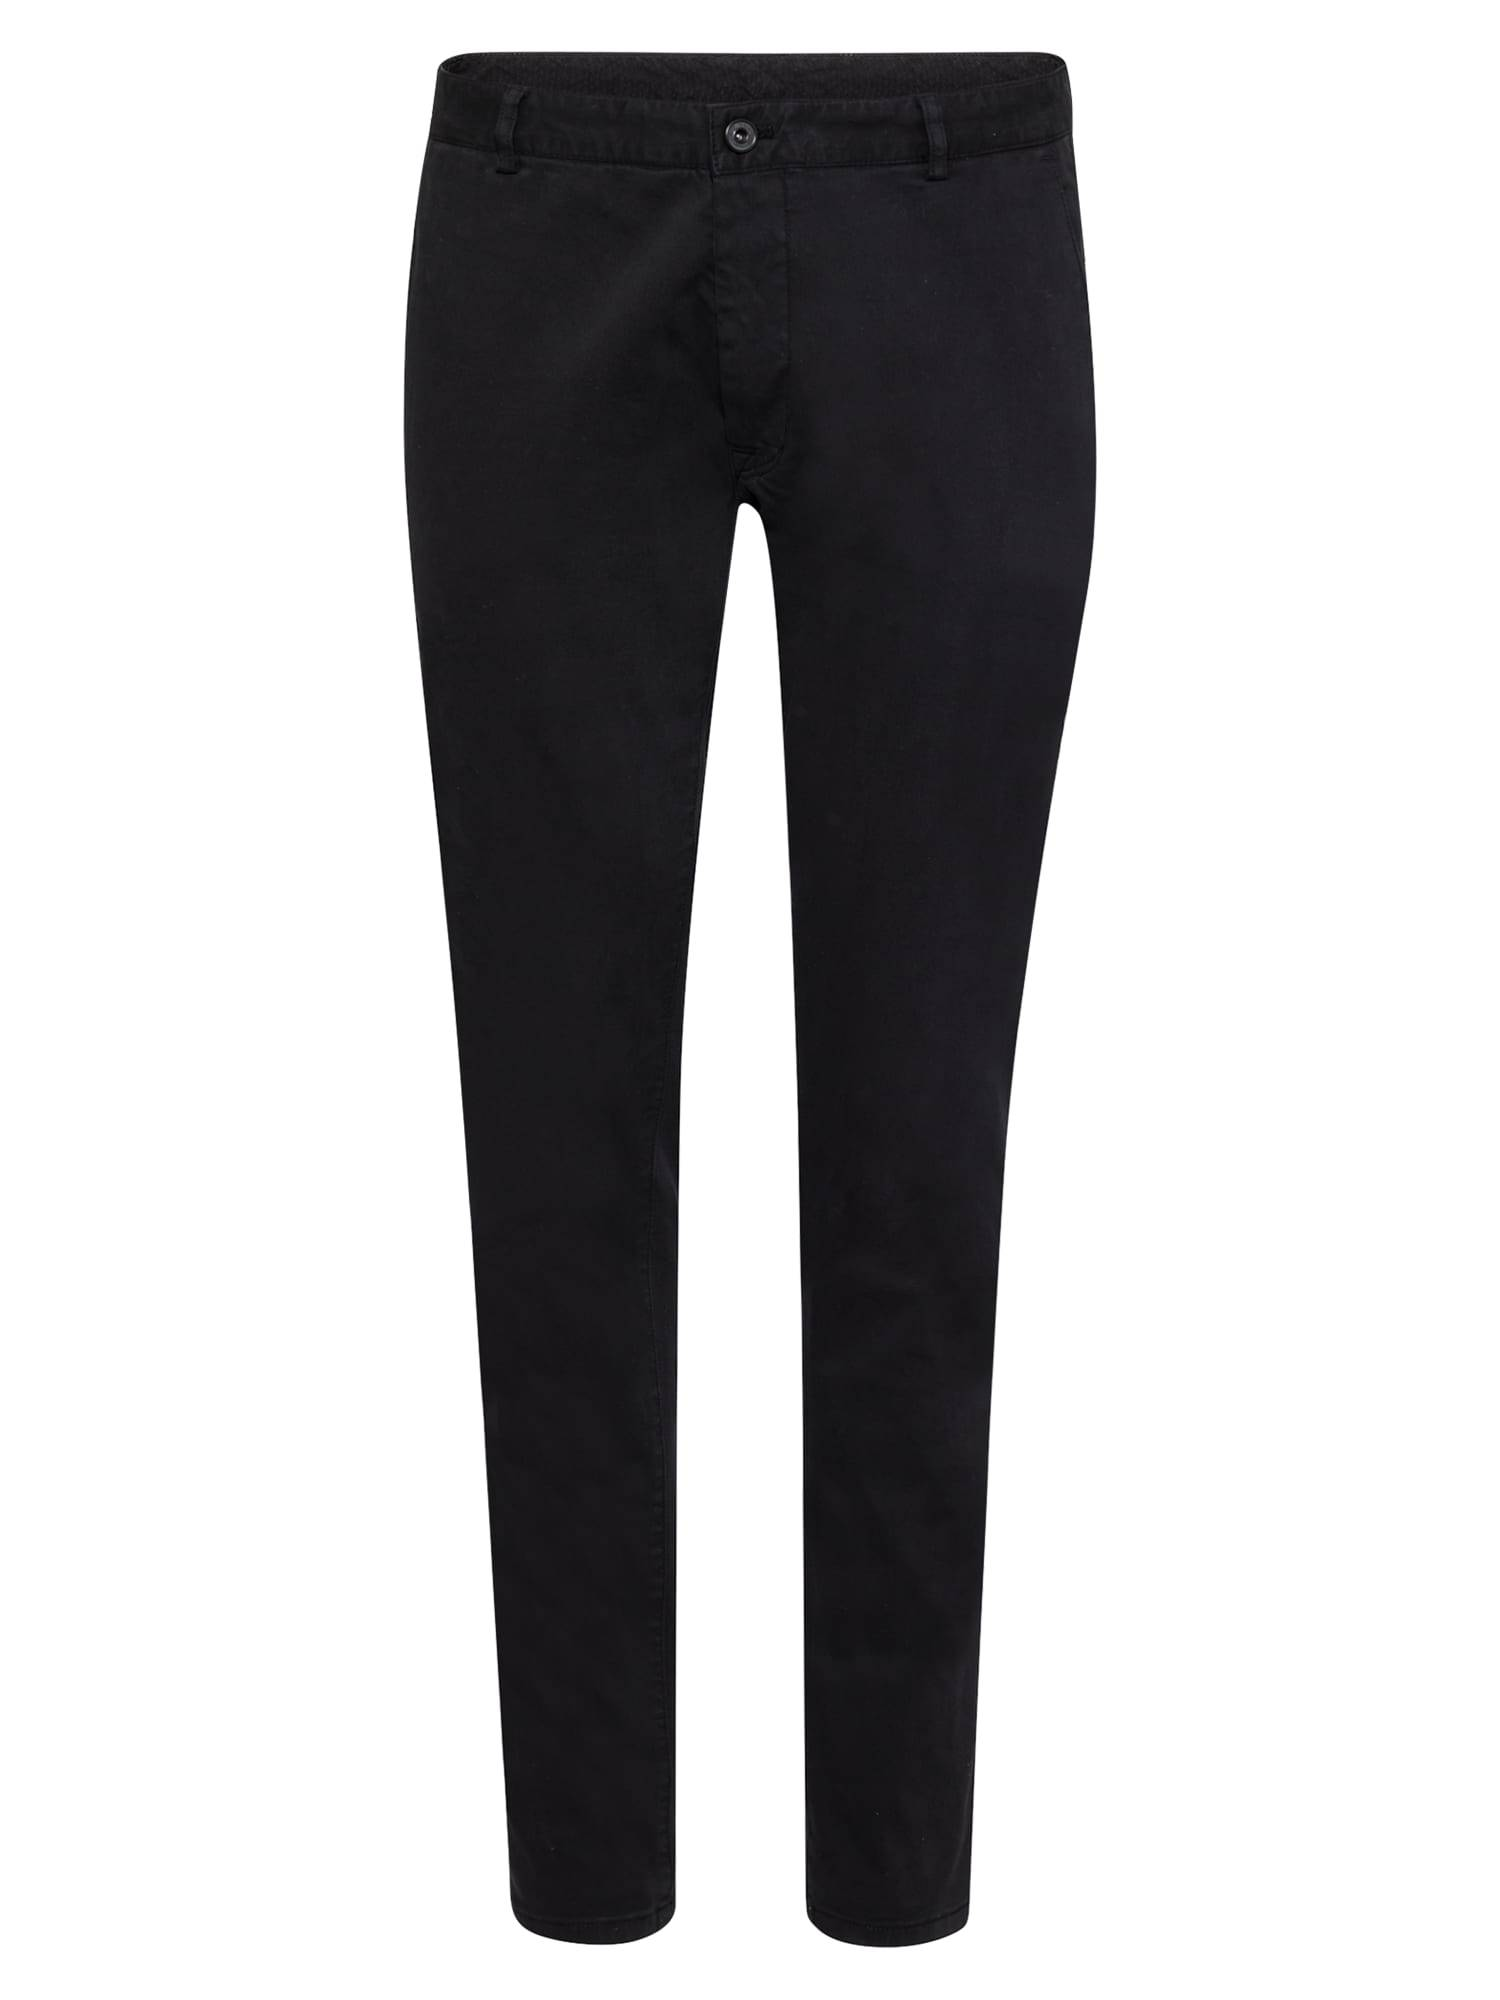 Tiger of Sweden Pantalon 'TRANSIT 4.'  - Noir - Taille: 48 - male